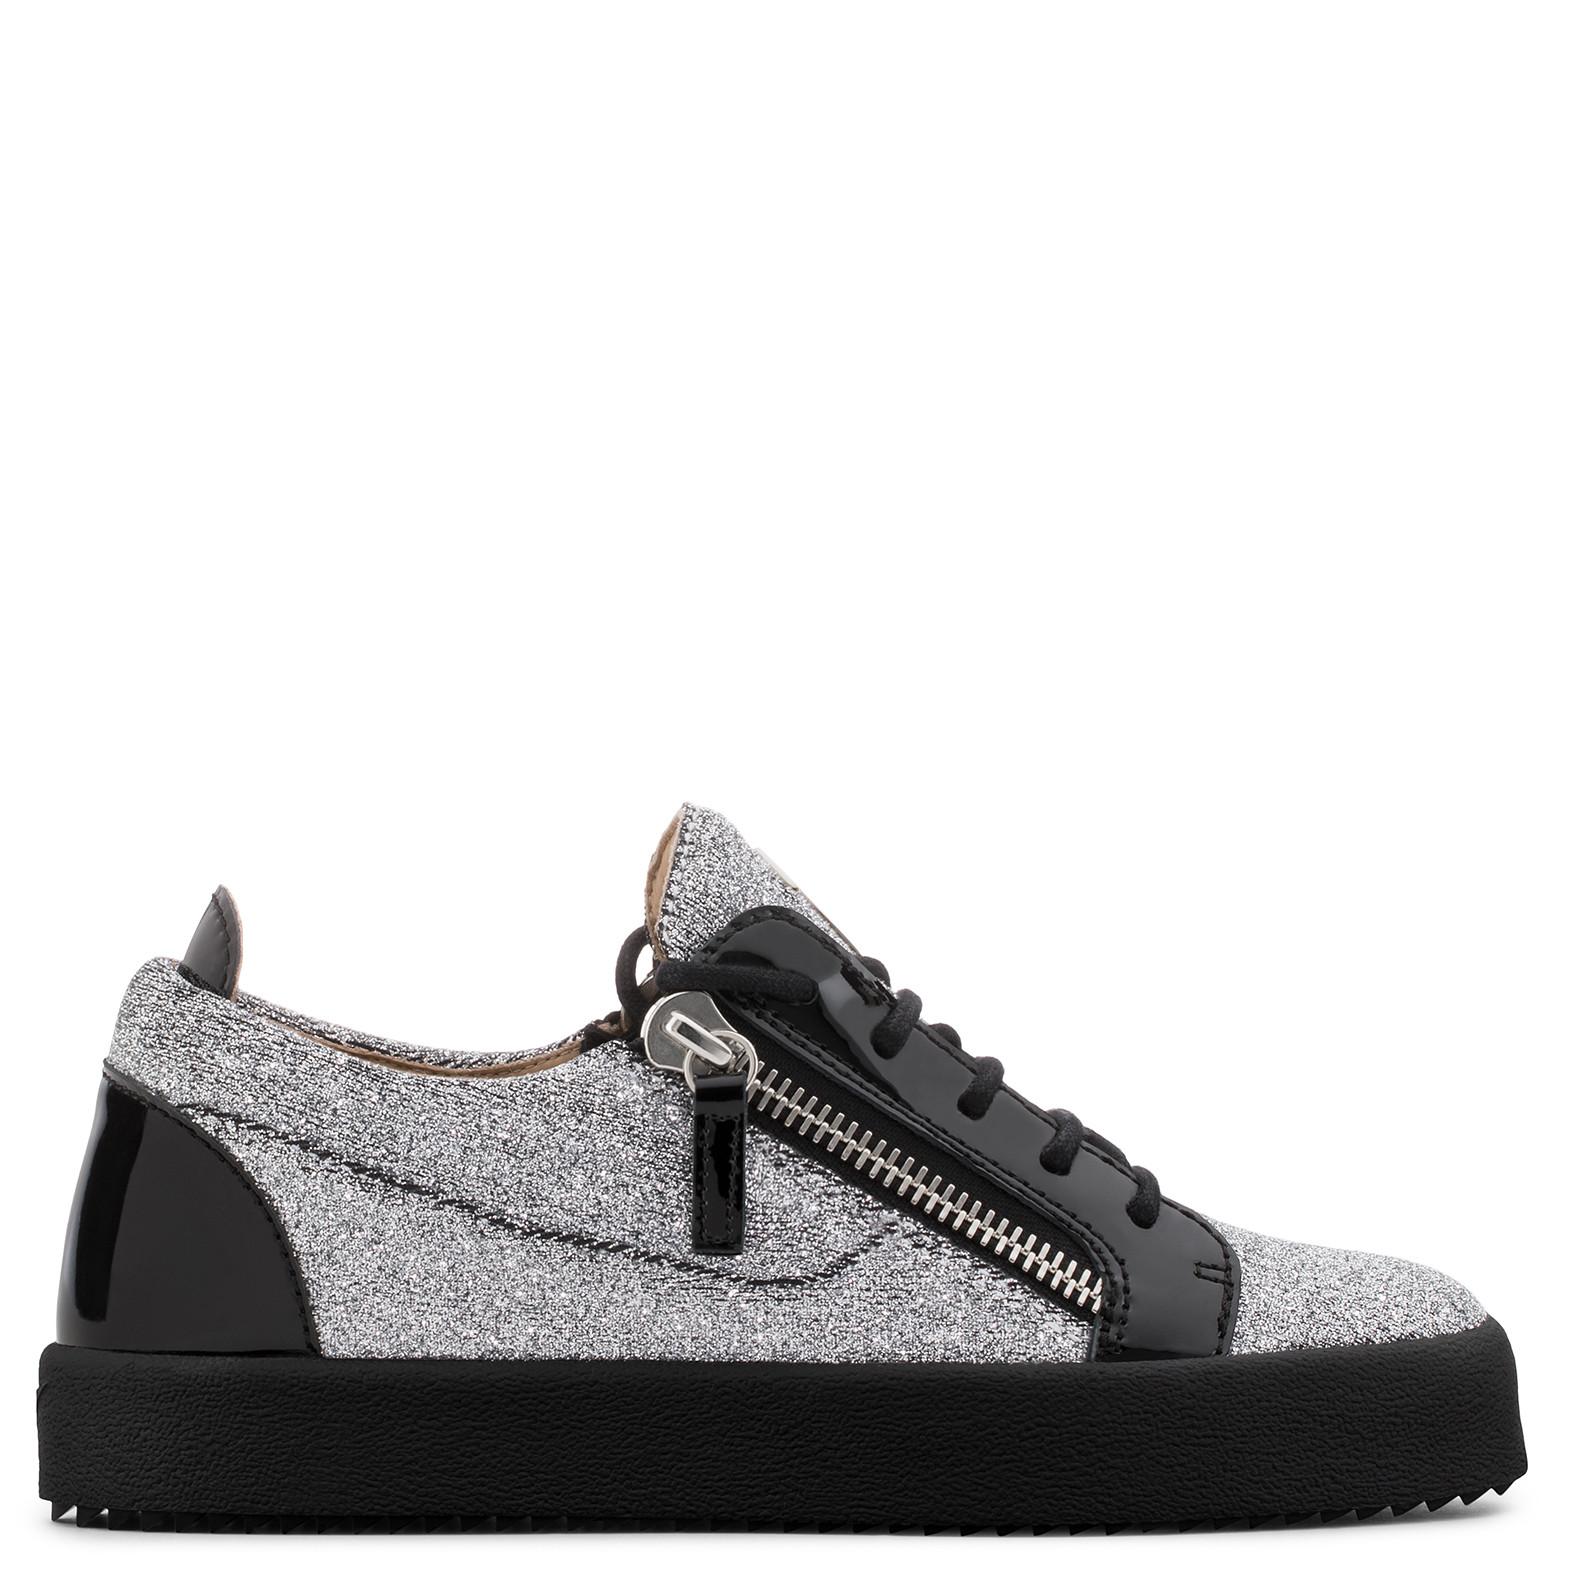 Giuseppe Zanotti Black fabric mid-top sneaker with silver glitter KRISS GLITTER 65mwb